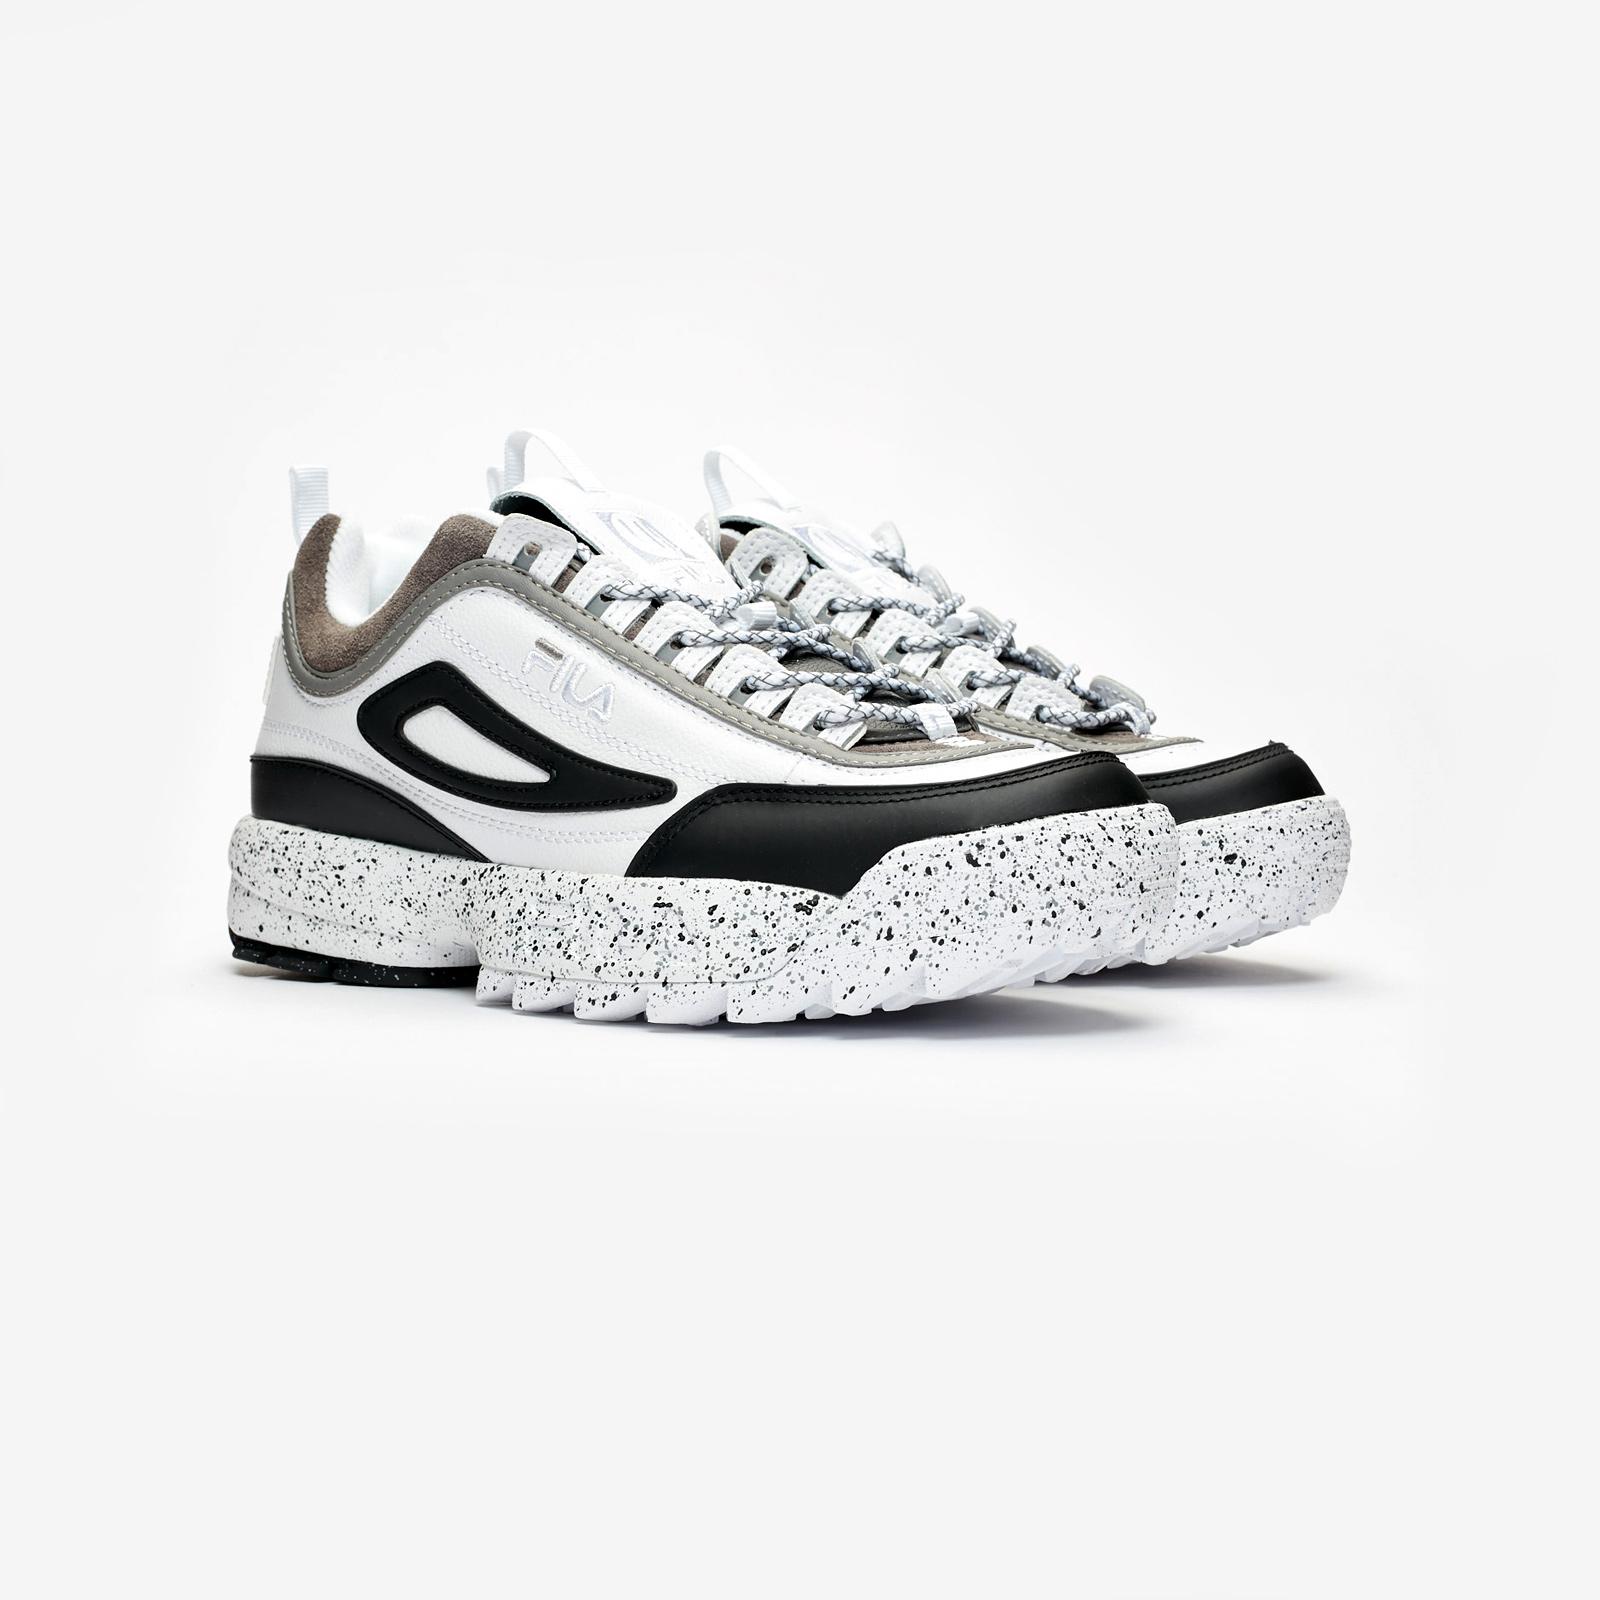 8c7ca440e92 Fila Disruptor X Liam Hodges - Lhf-aw18-312-mut - Sneakersnstuff ...